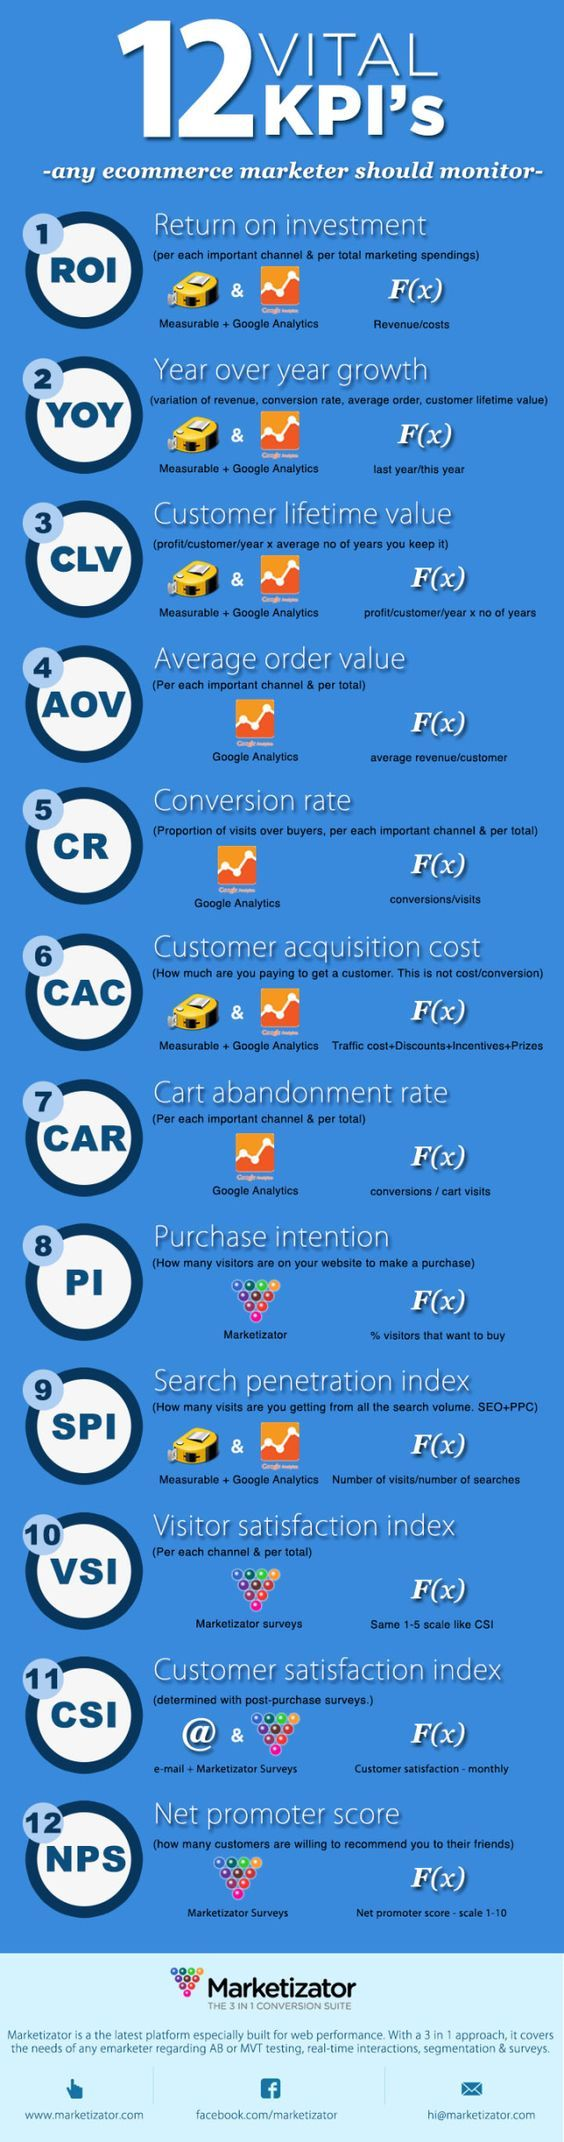 12 vital KPI's any commerce marketer should monitor #infografia #infographic #ecommerce